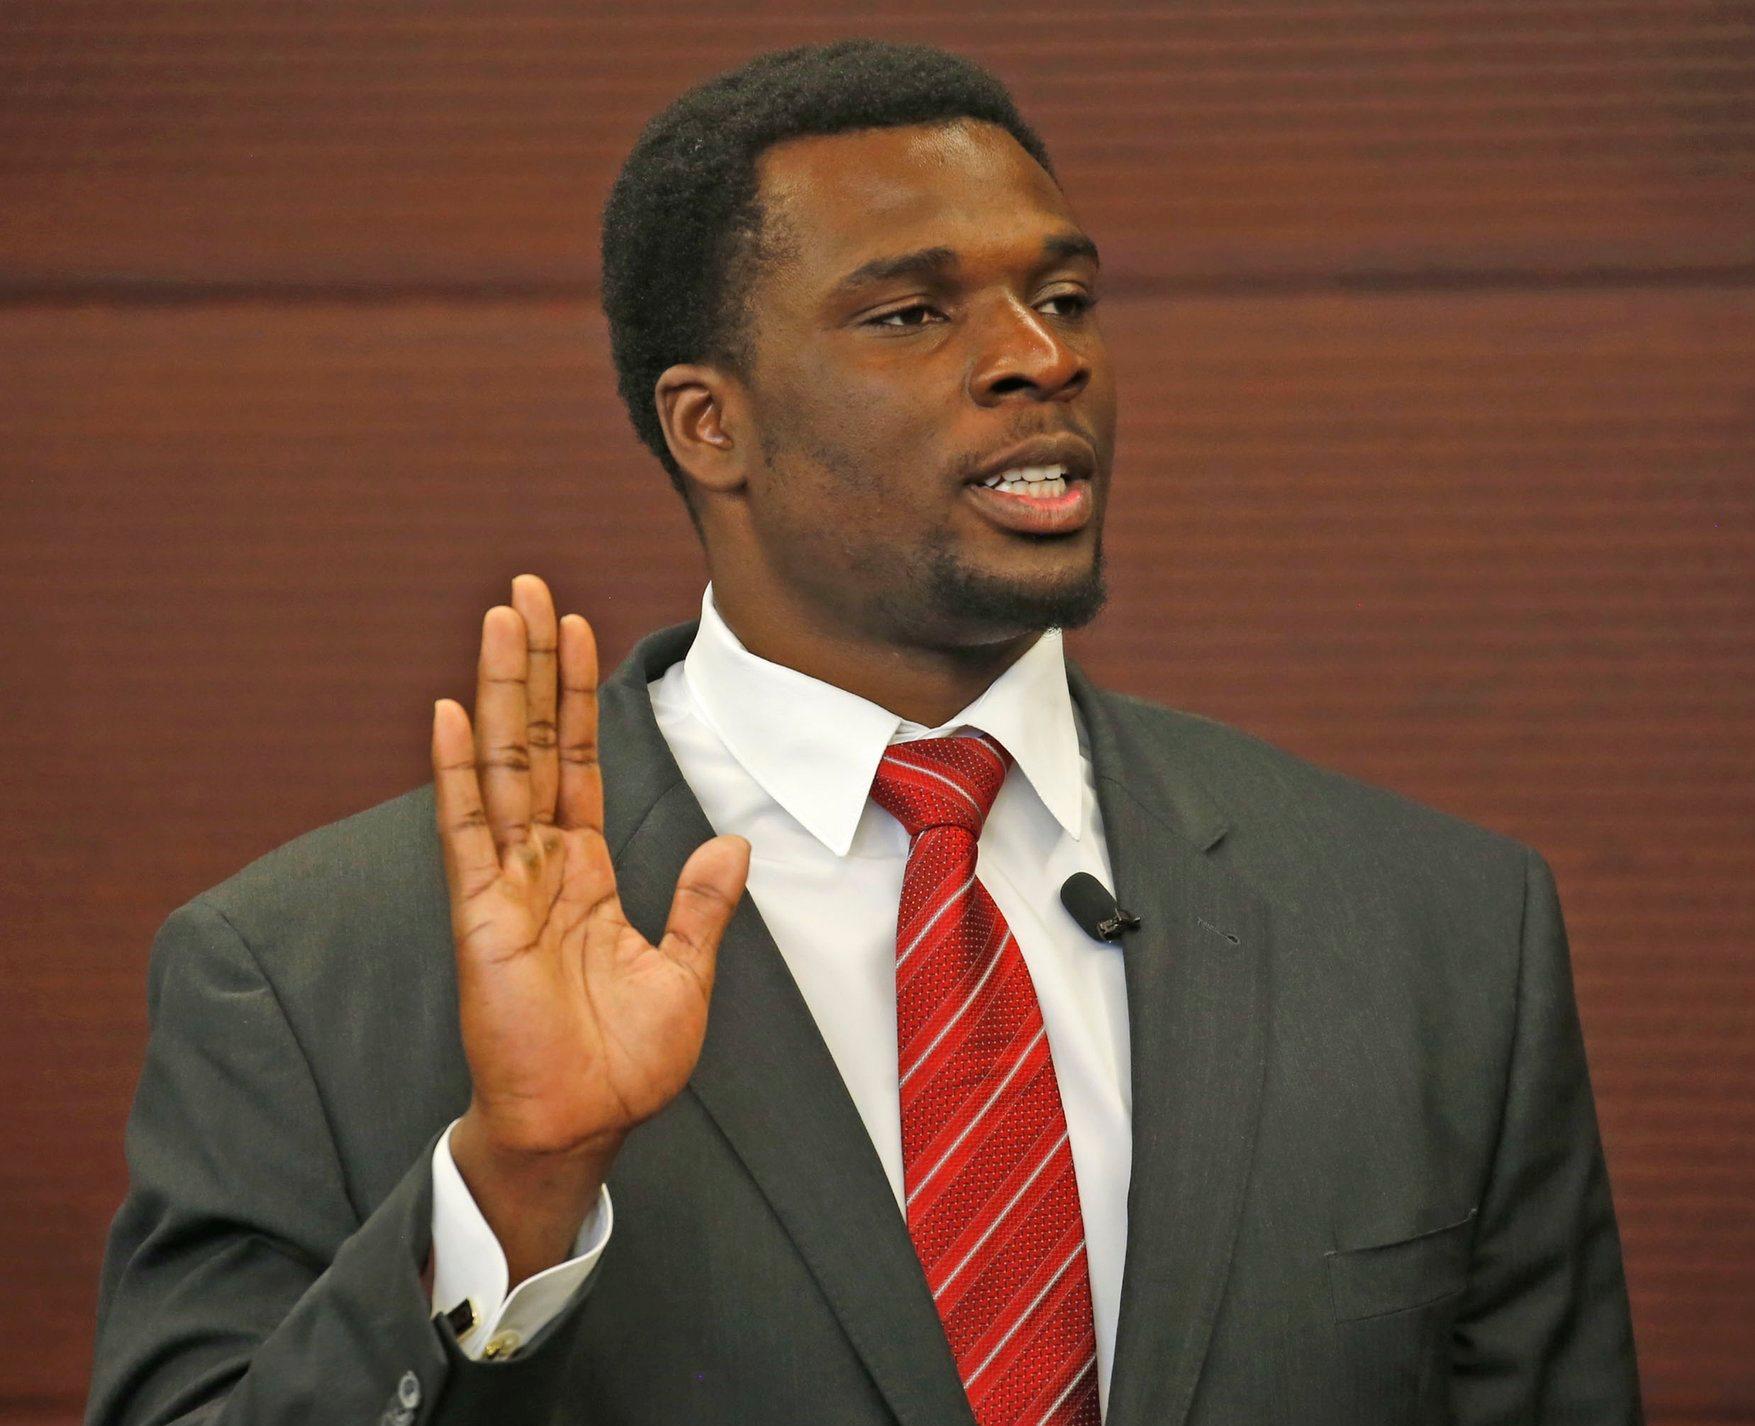 Buffalo Bills lineman Cyrus Kouandjio, originally from Cameroon, Africa, became a U.S. citizen today in Buffalo court. (Robert Kirkham/Buffalo News)